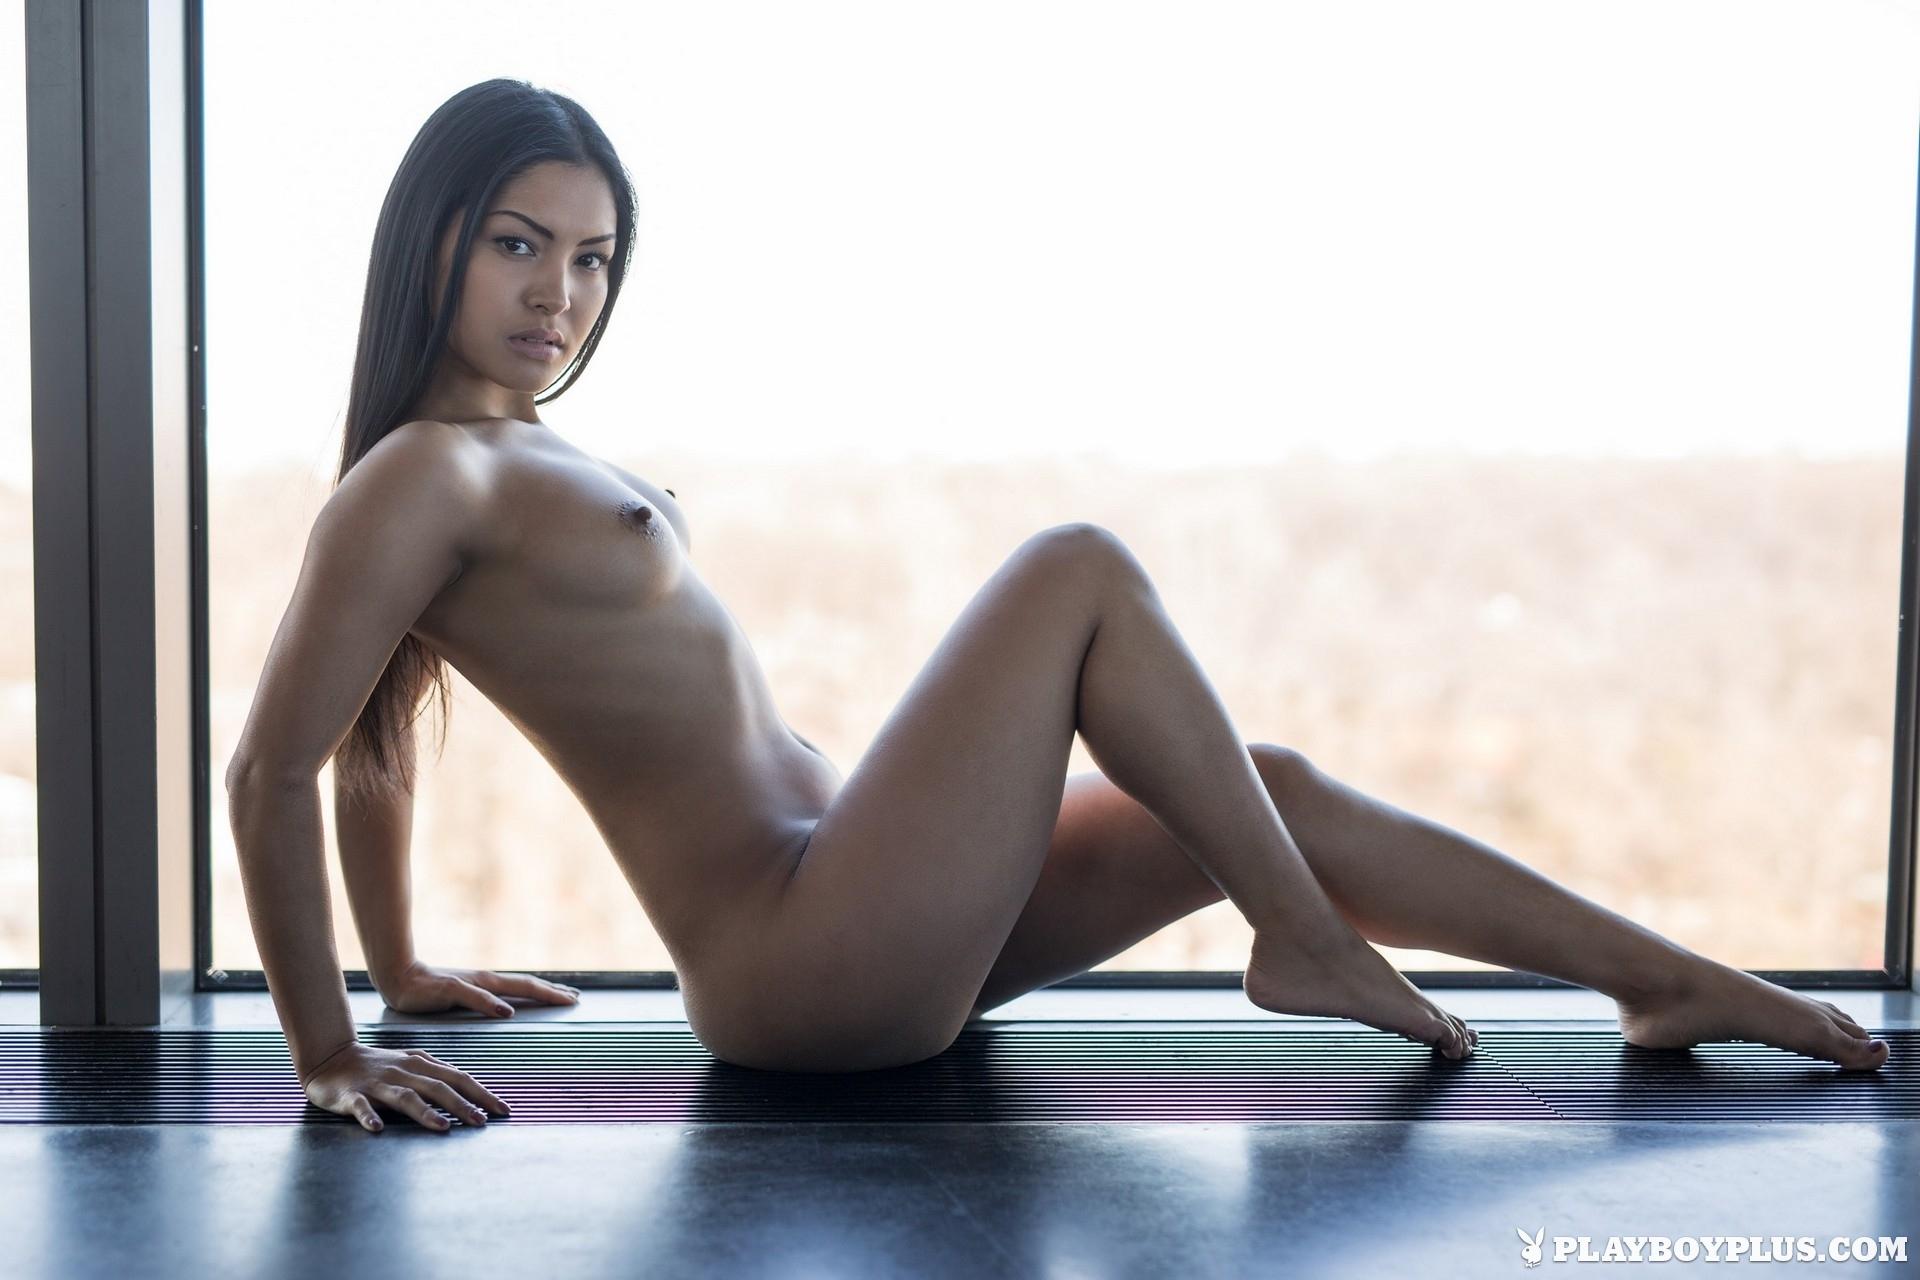 Playboy Plus Chloe Rose In Inspiring View (19)